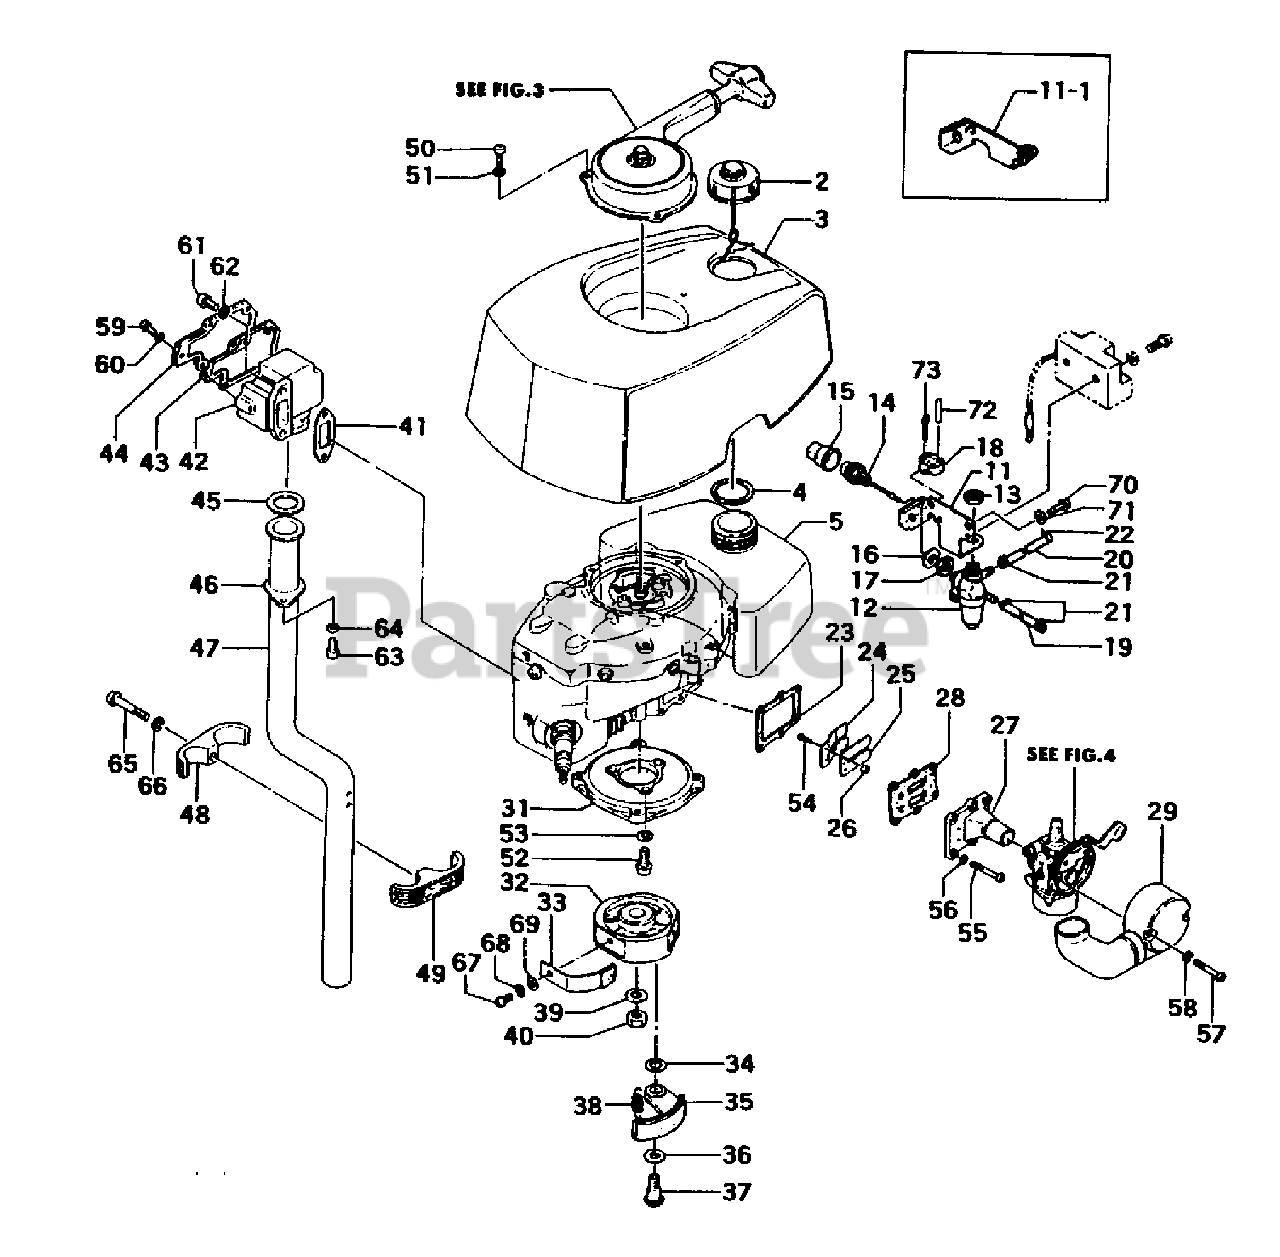 [ZTBE_9966]  Tanaka TOB-175 - Tanaka 1.75HP Outboard Engine Tank, Clutch & Muffler Parts  Lookup with Diagrams   PartsTree   Outboard Engine Diagram Clutch      PartsTree